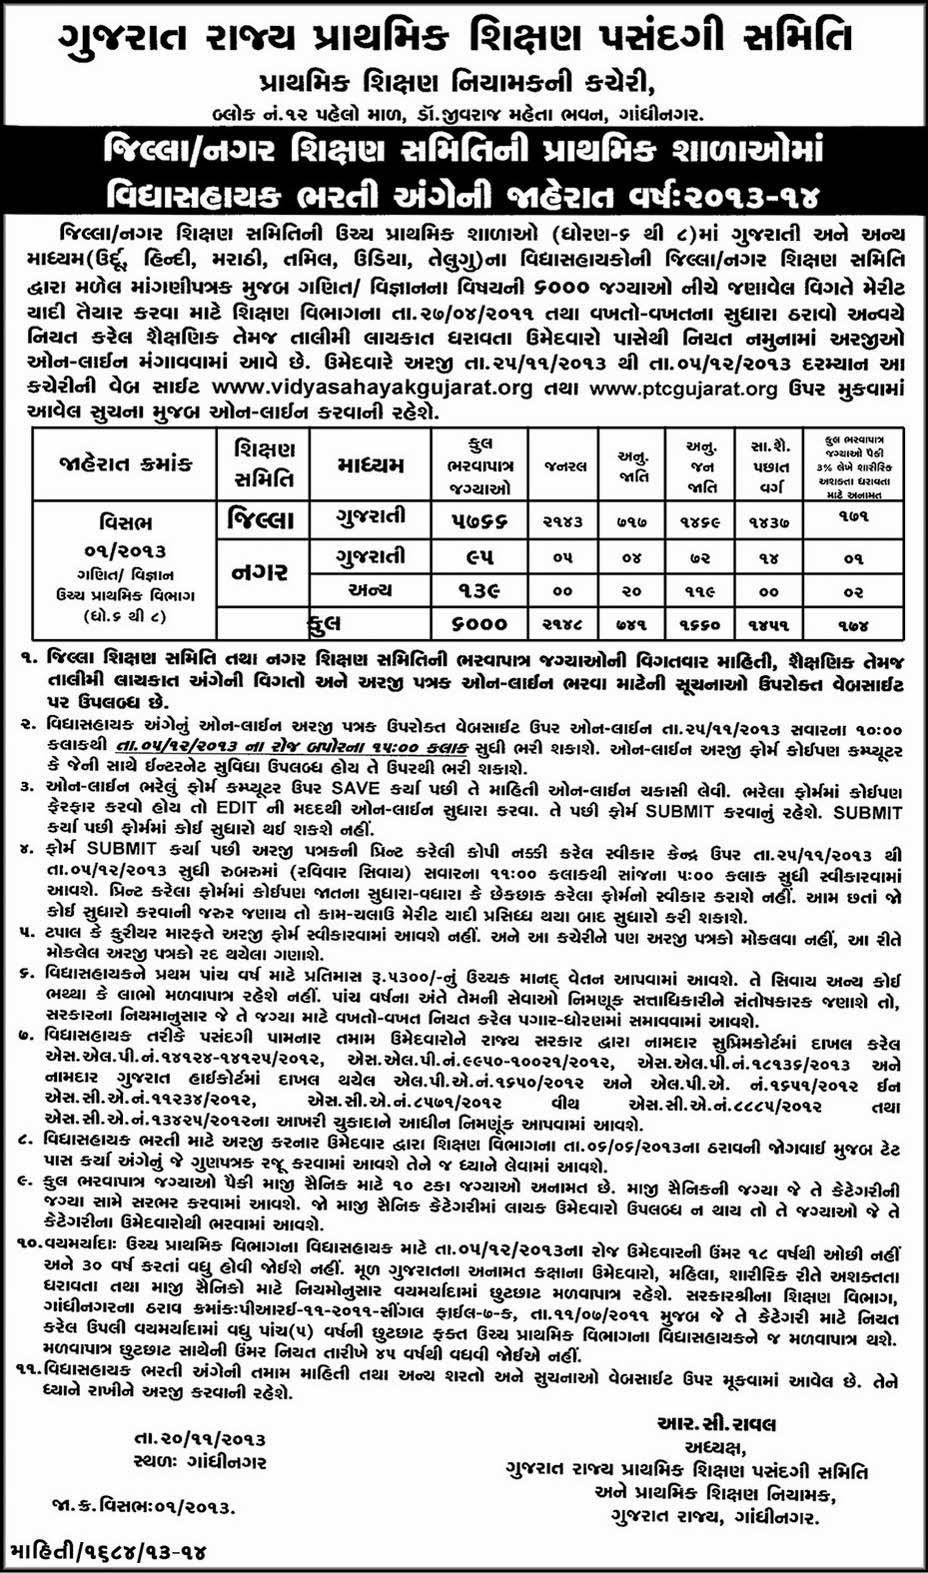 Vidhyasahayak bharti 2013 14 for math science candidates standadard 6 to 8 6000 vacancies